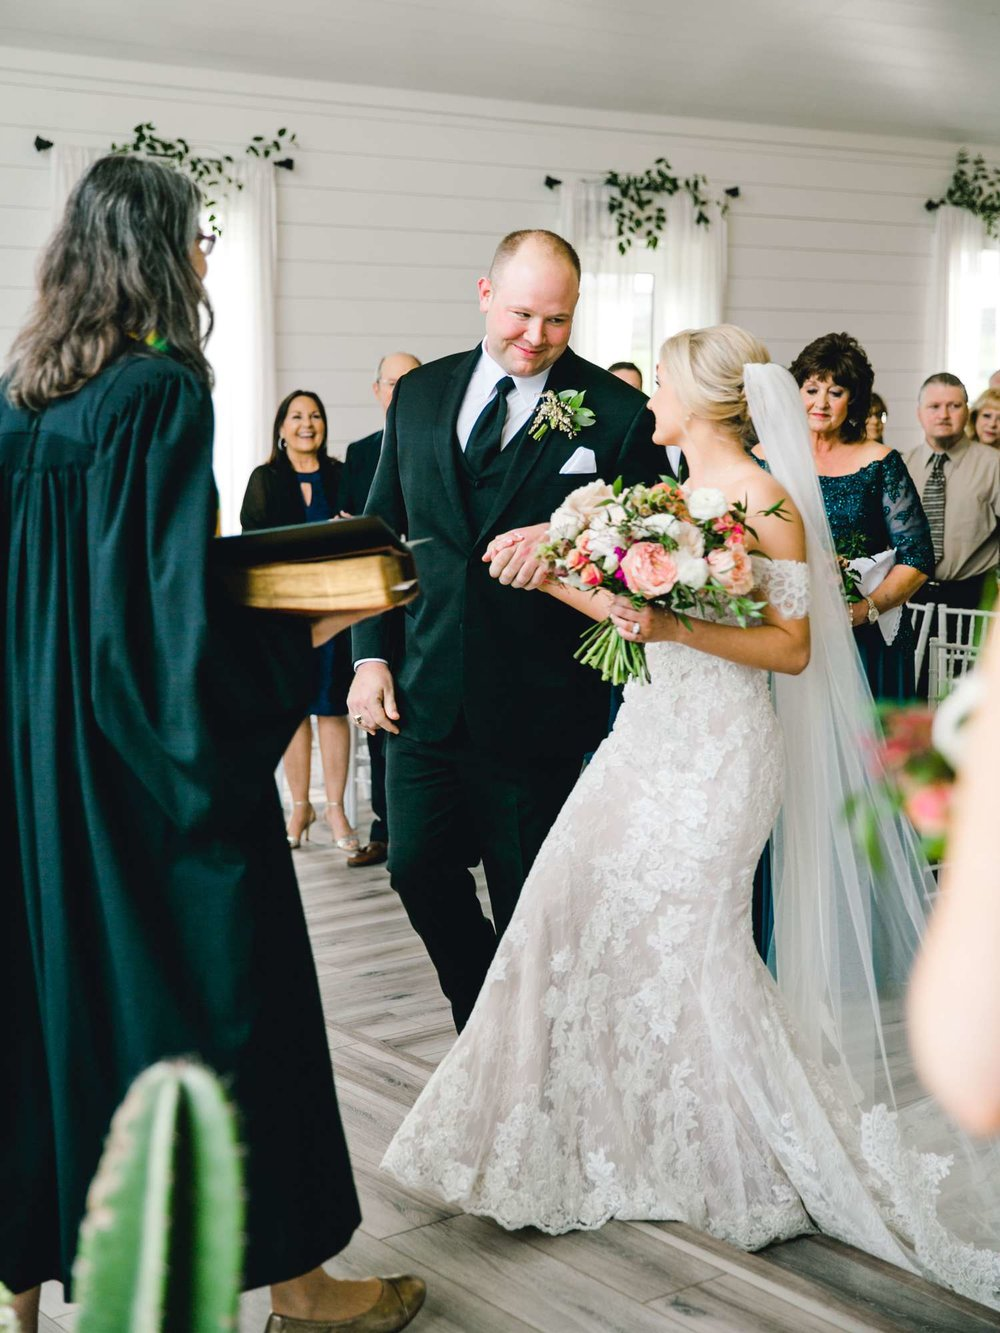 HEBERT_MORGAN_AND_CLAY_ALLEEJ_THE_FARMHOUSE_MONTGOMERY_TEXAS_WEDDING_0085.jpg